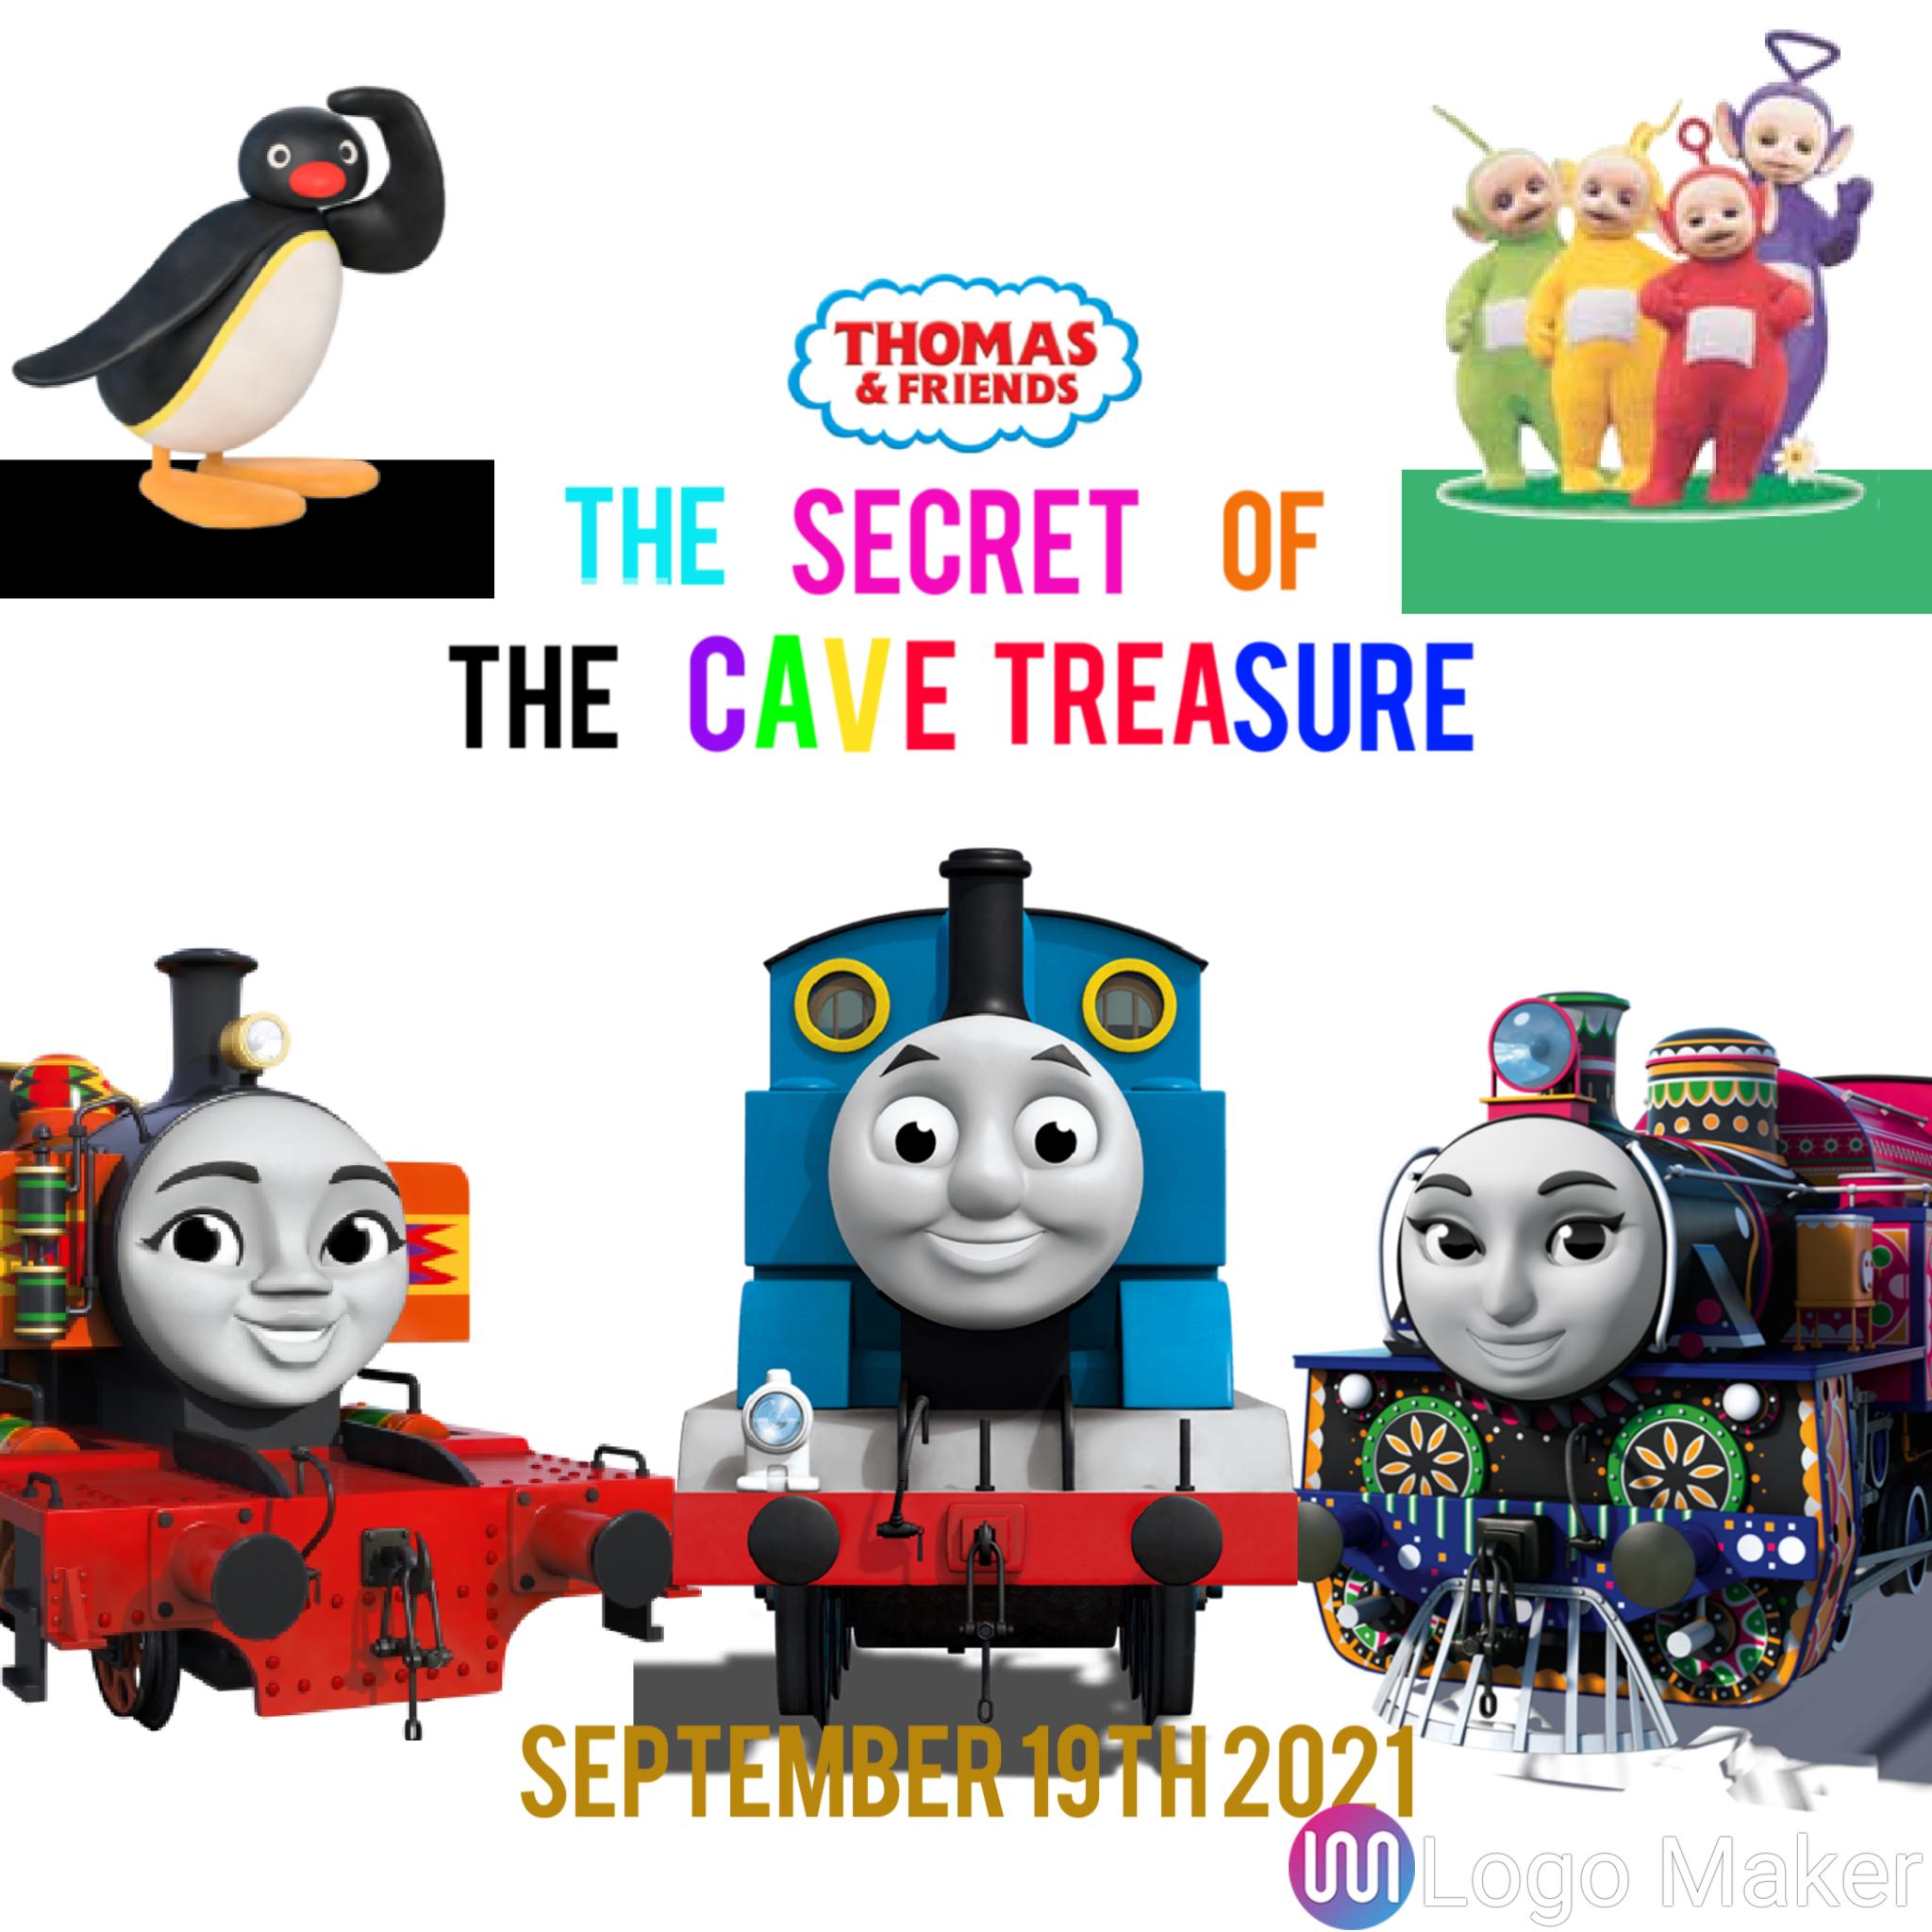 The Secret of the Cave Treasure